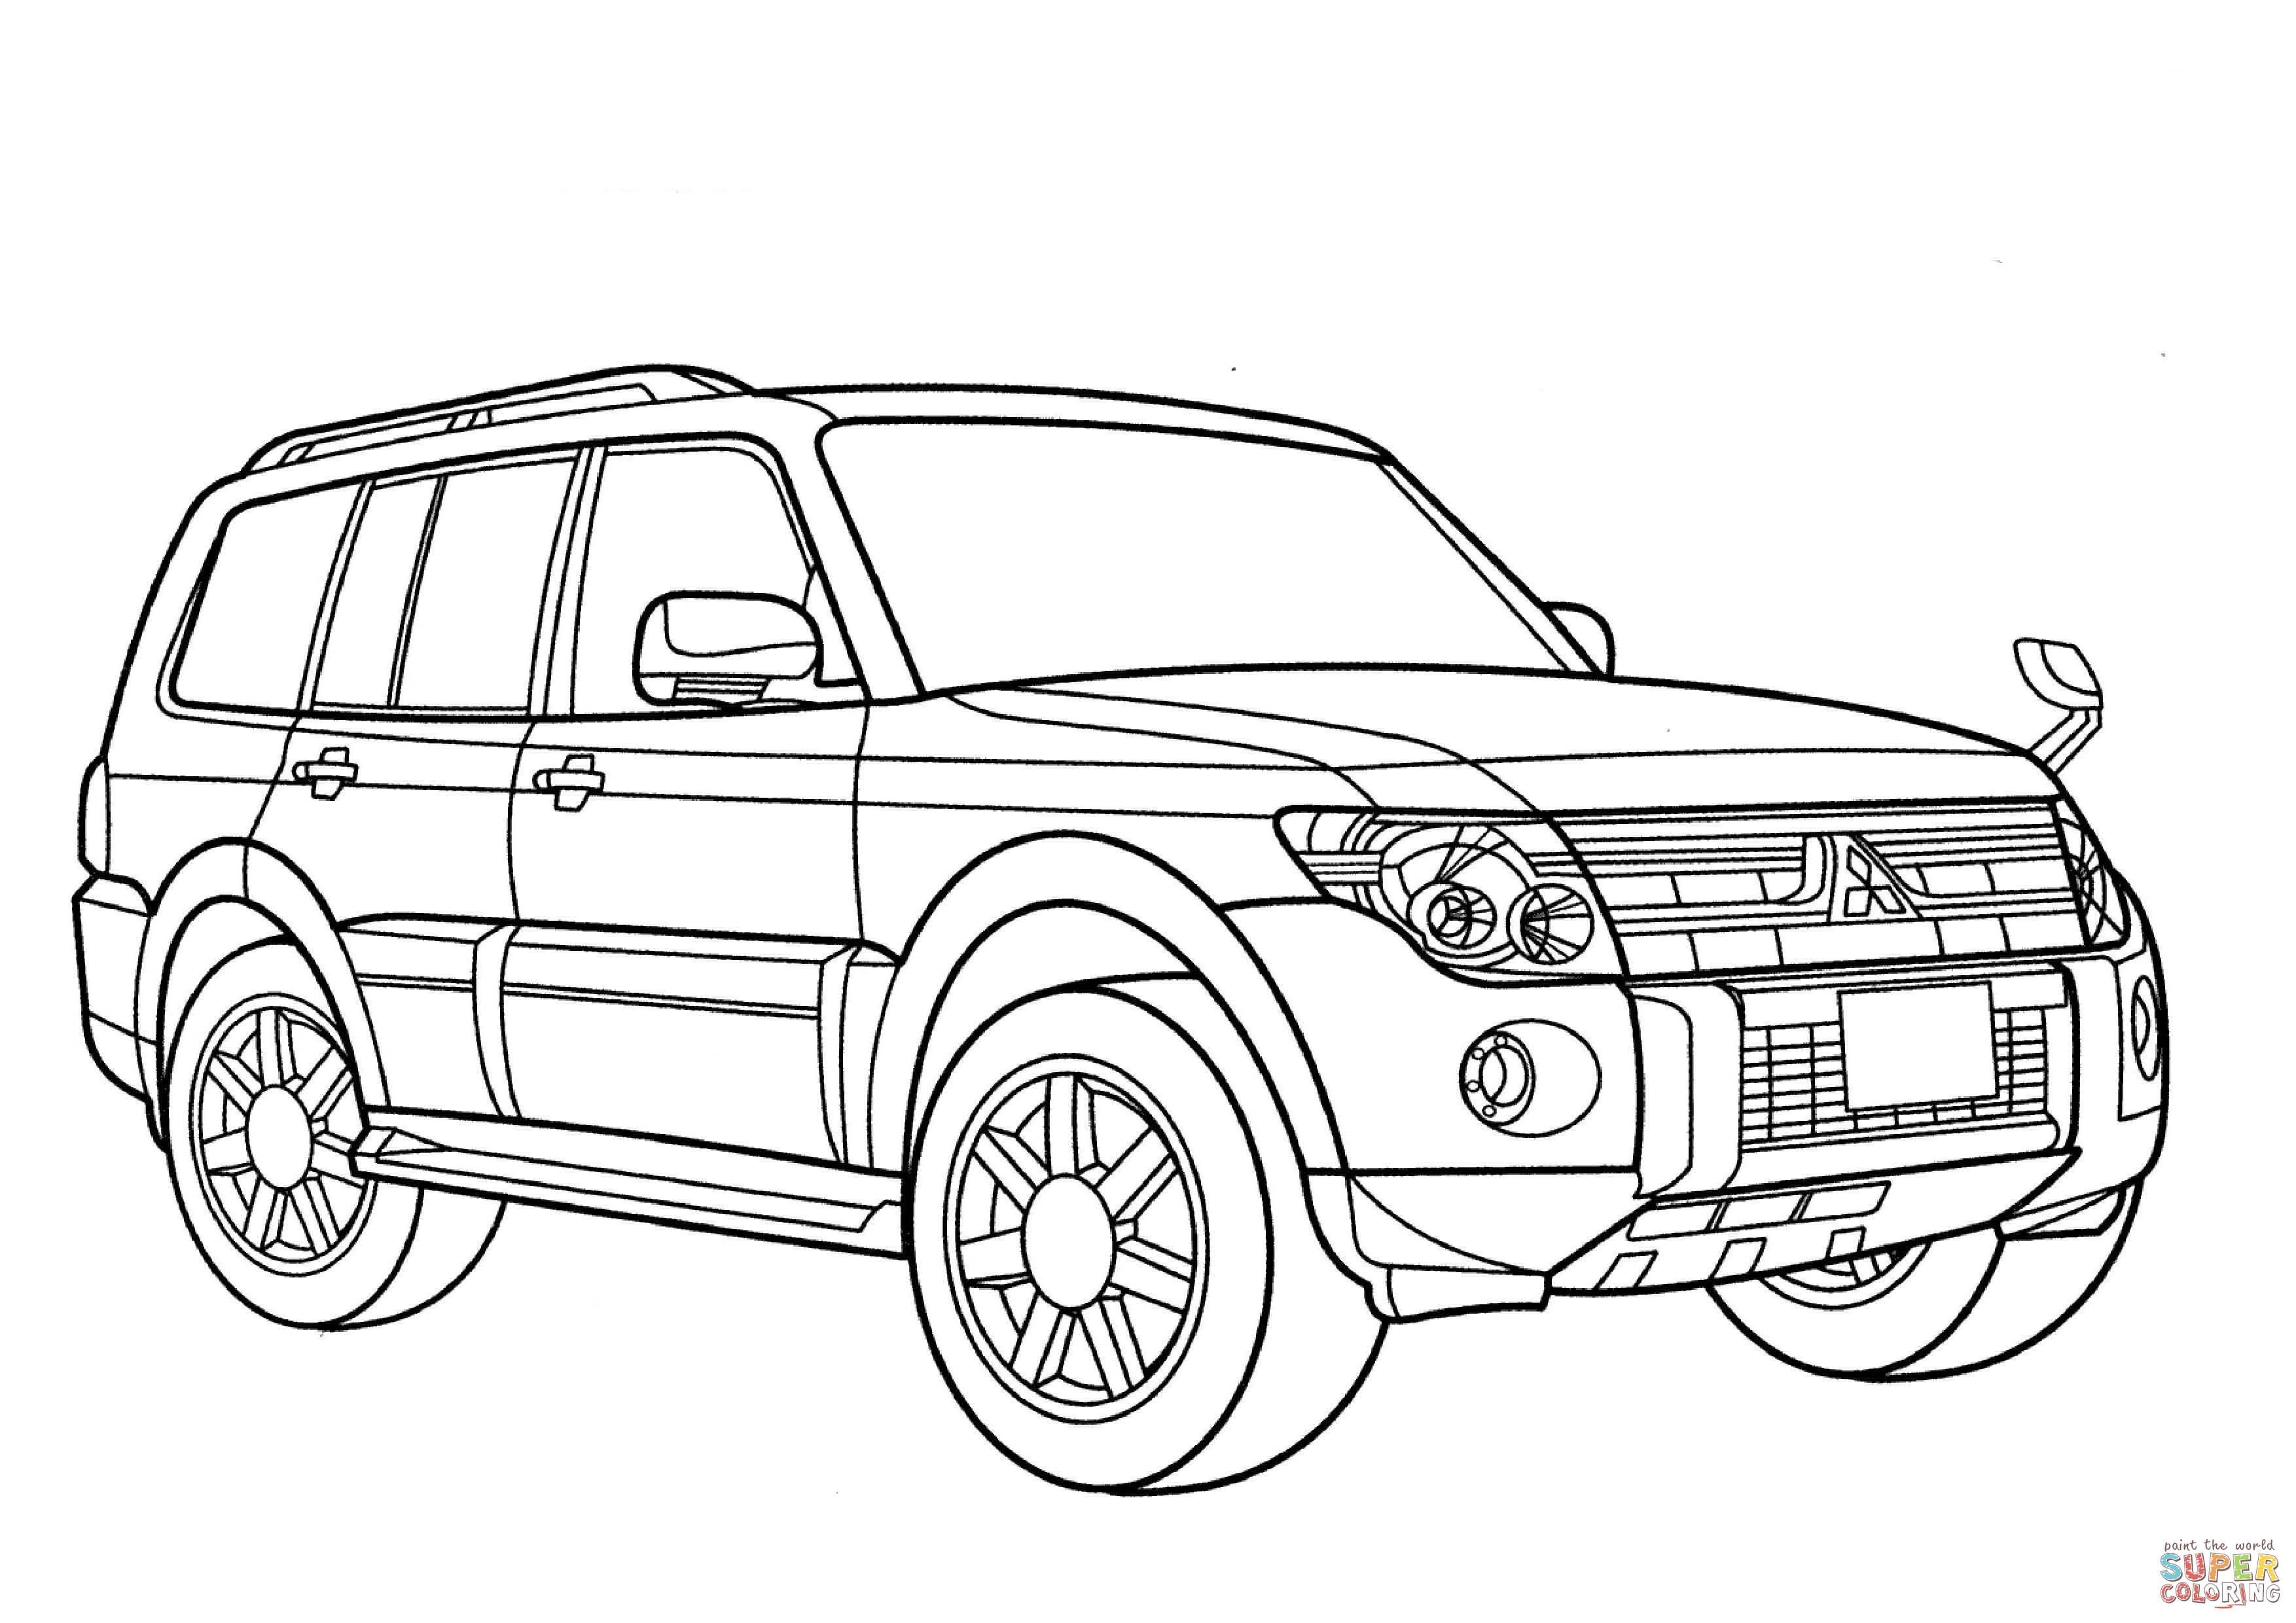 Mitsubishi Pajero Coloring Page